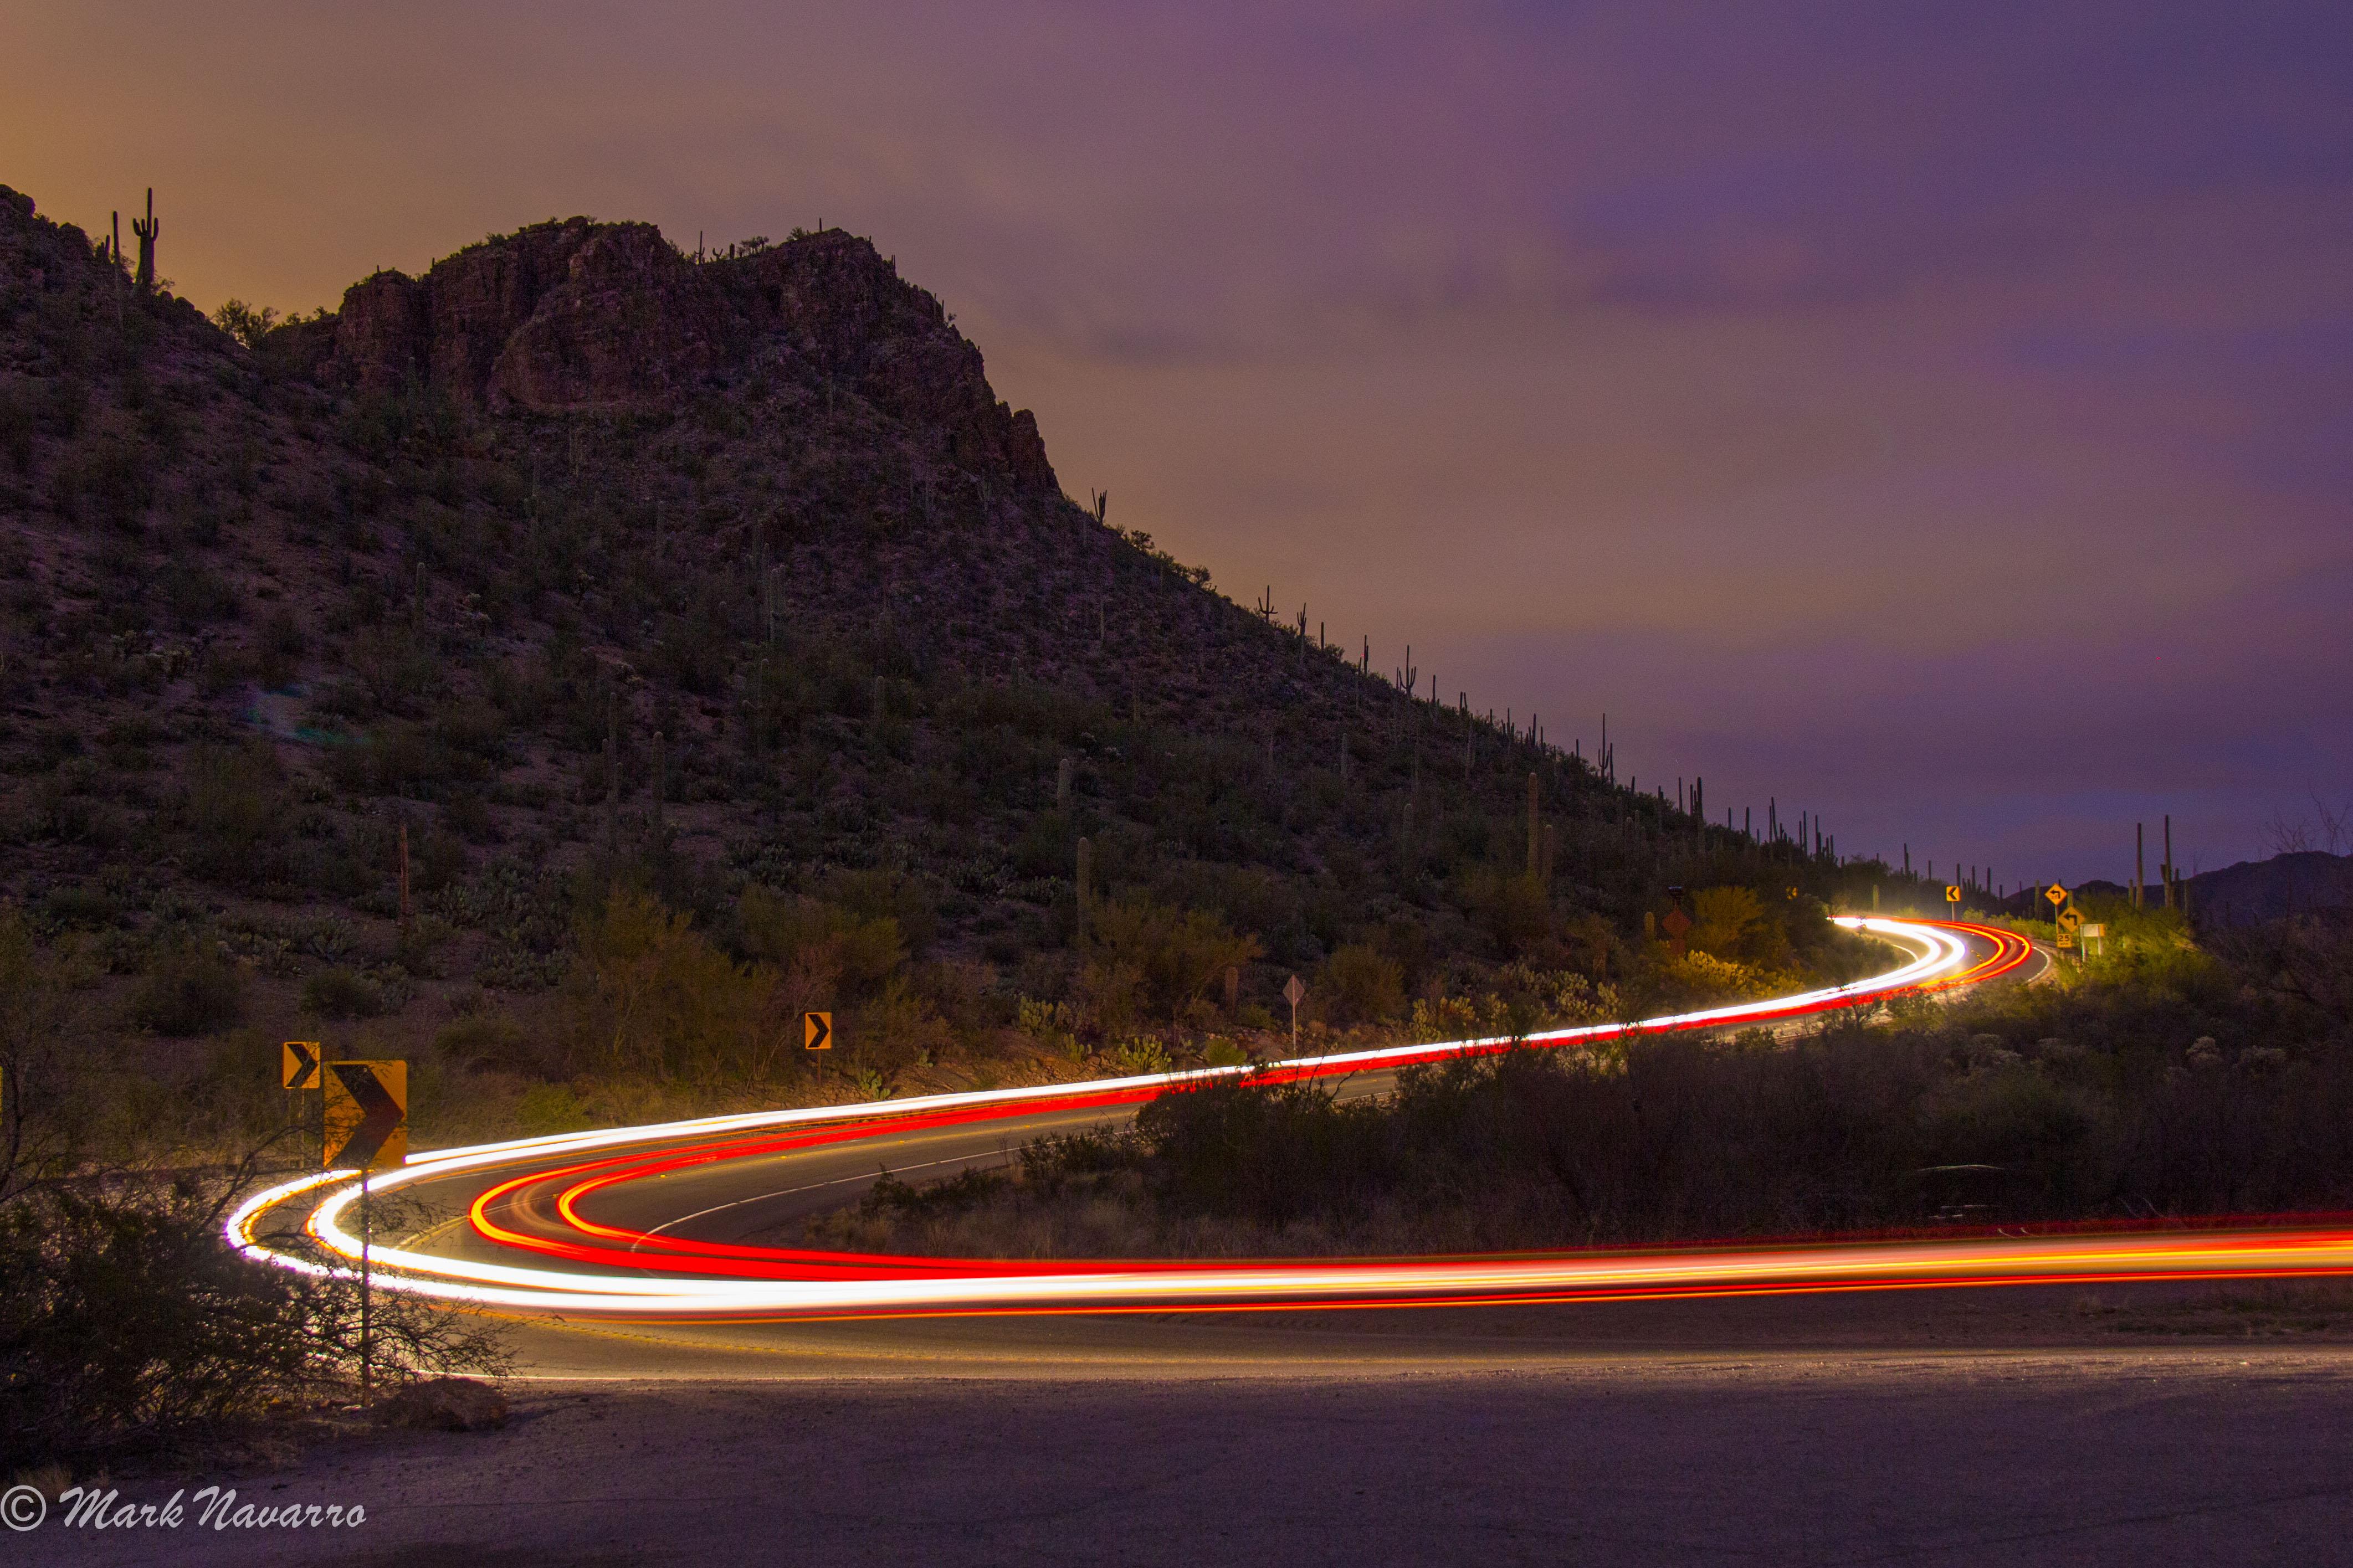 Wallpaper : lights, mountains, sunset, night, reflection, road